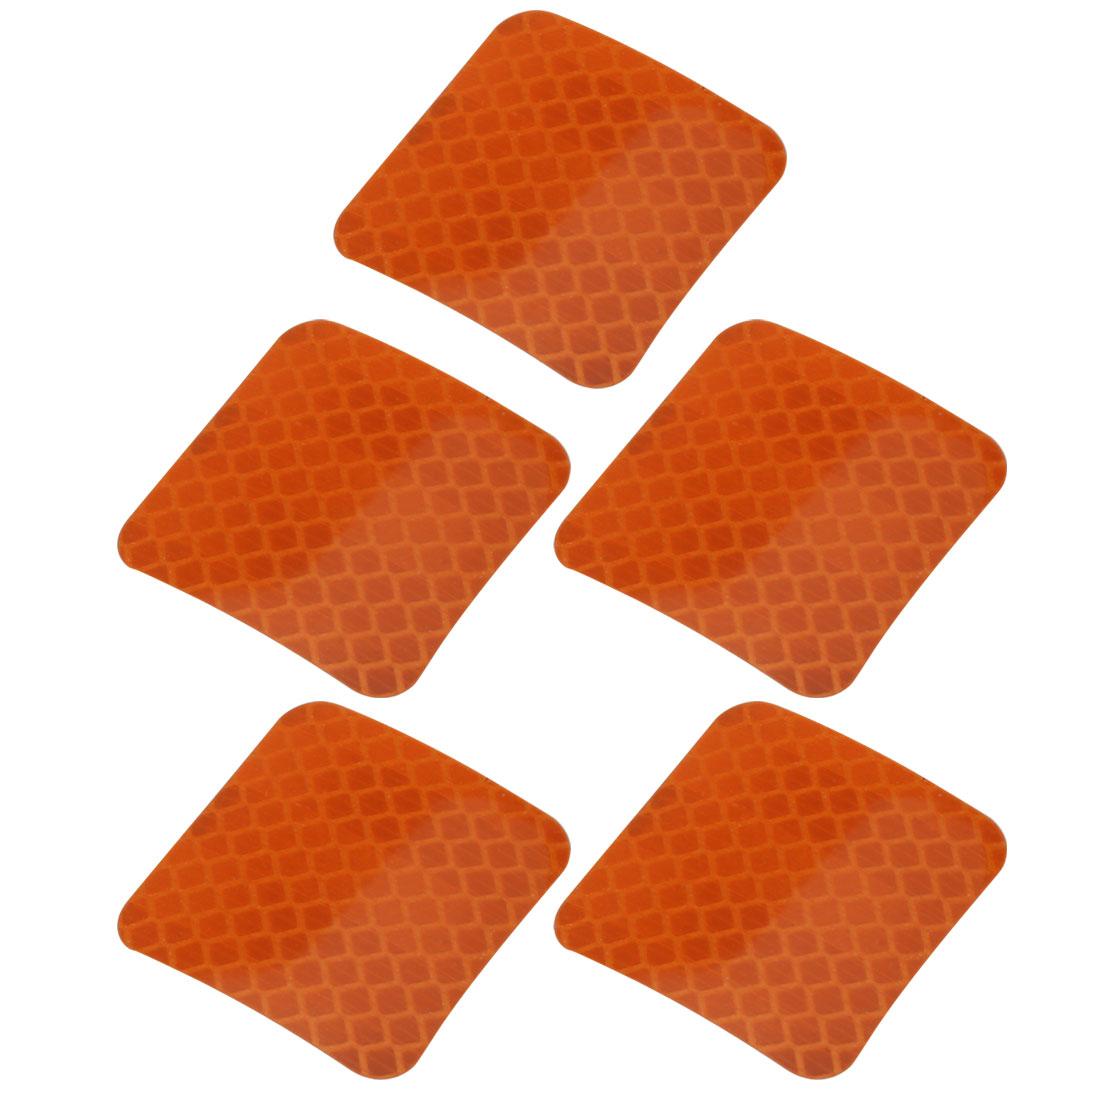 5pcs Honeycomb Reflective Warning Tape Film Sticker Orange 40mm x 40mm